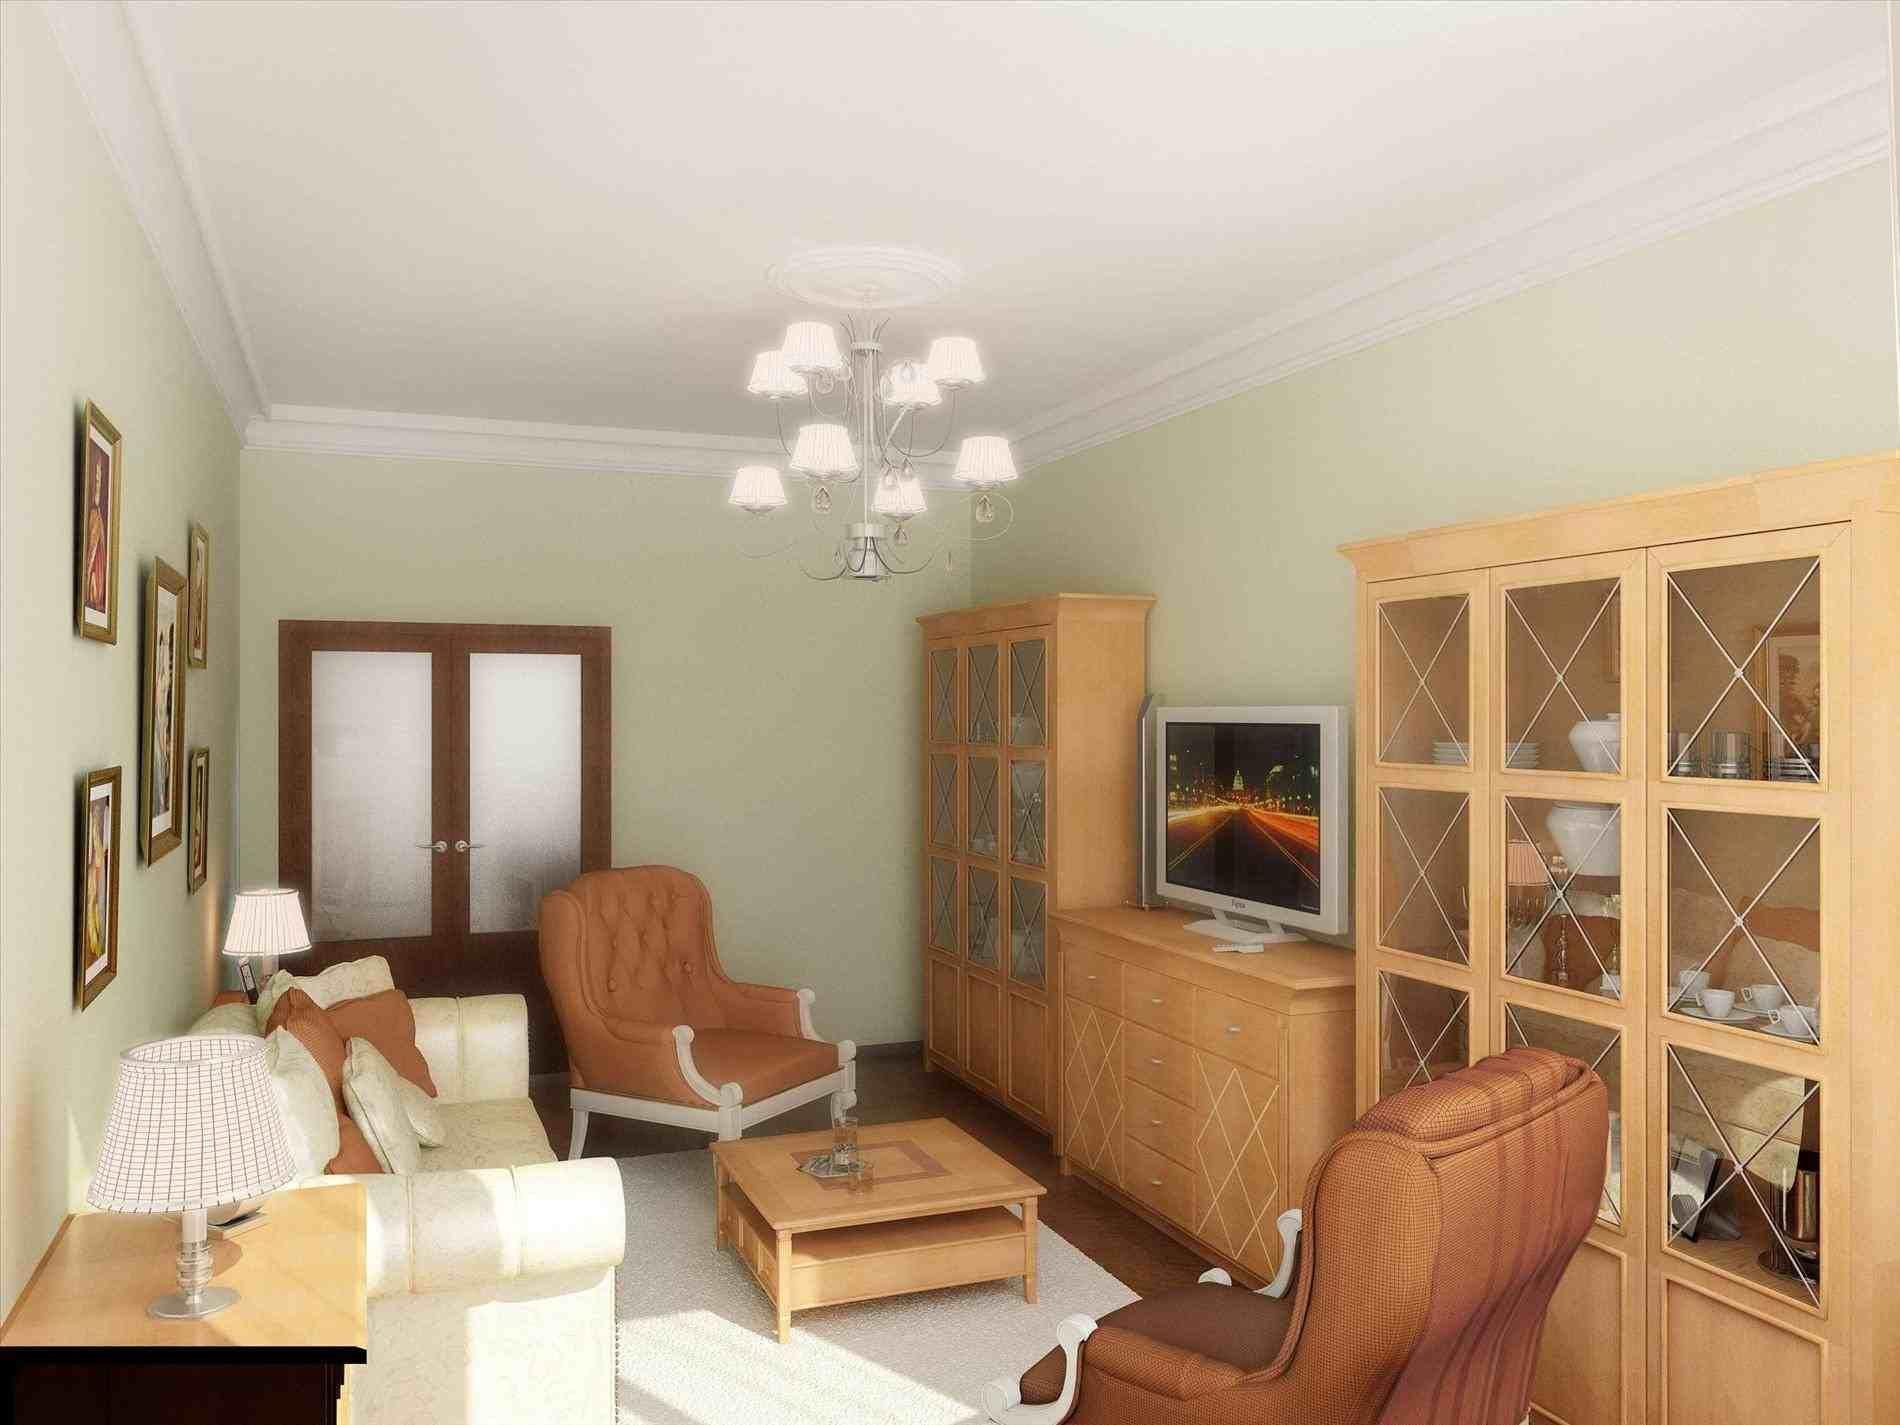 home interiors living room ideas  house stuff  Pinterest  Living